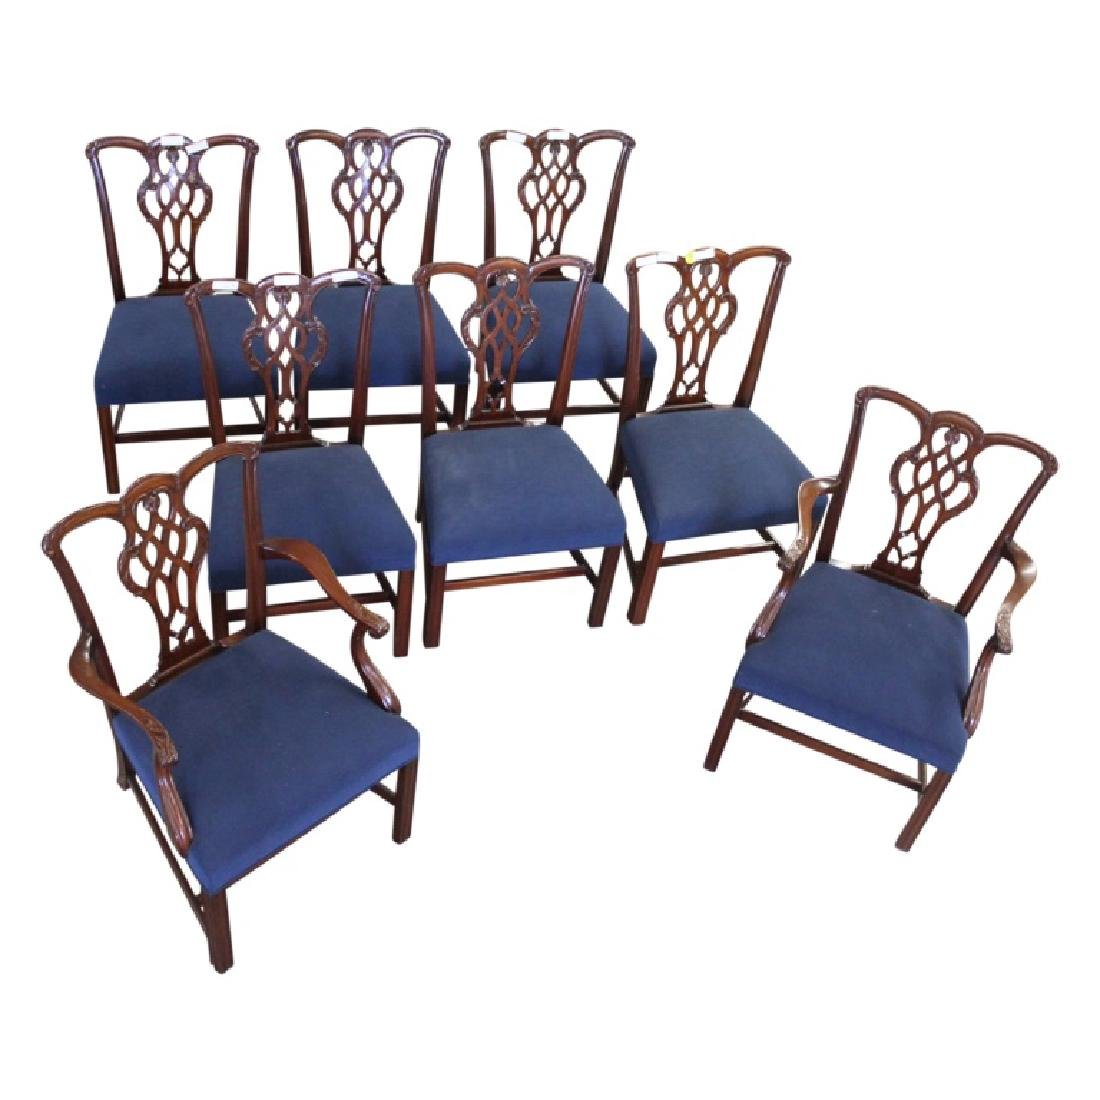 Schmieg & Kotztan Dining Chairs - 8 PCS - 3